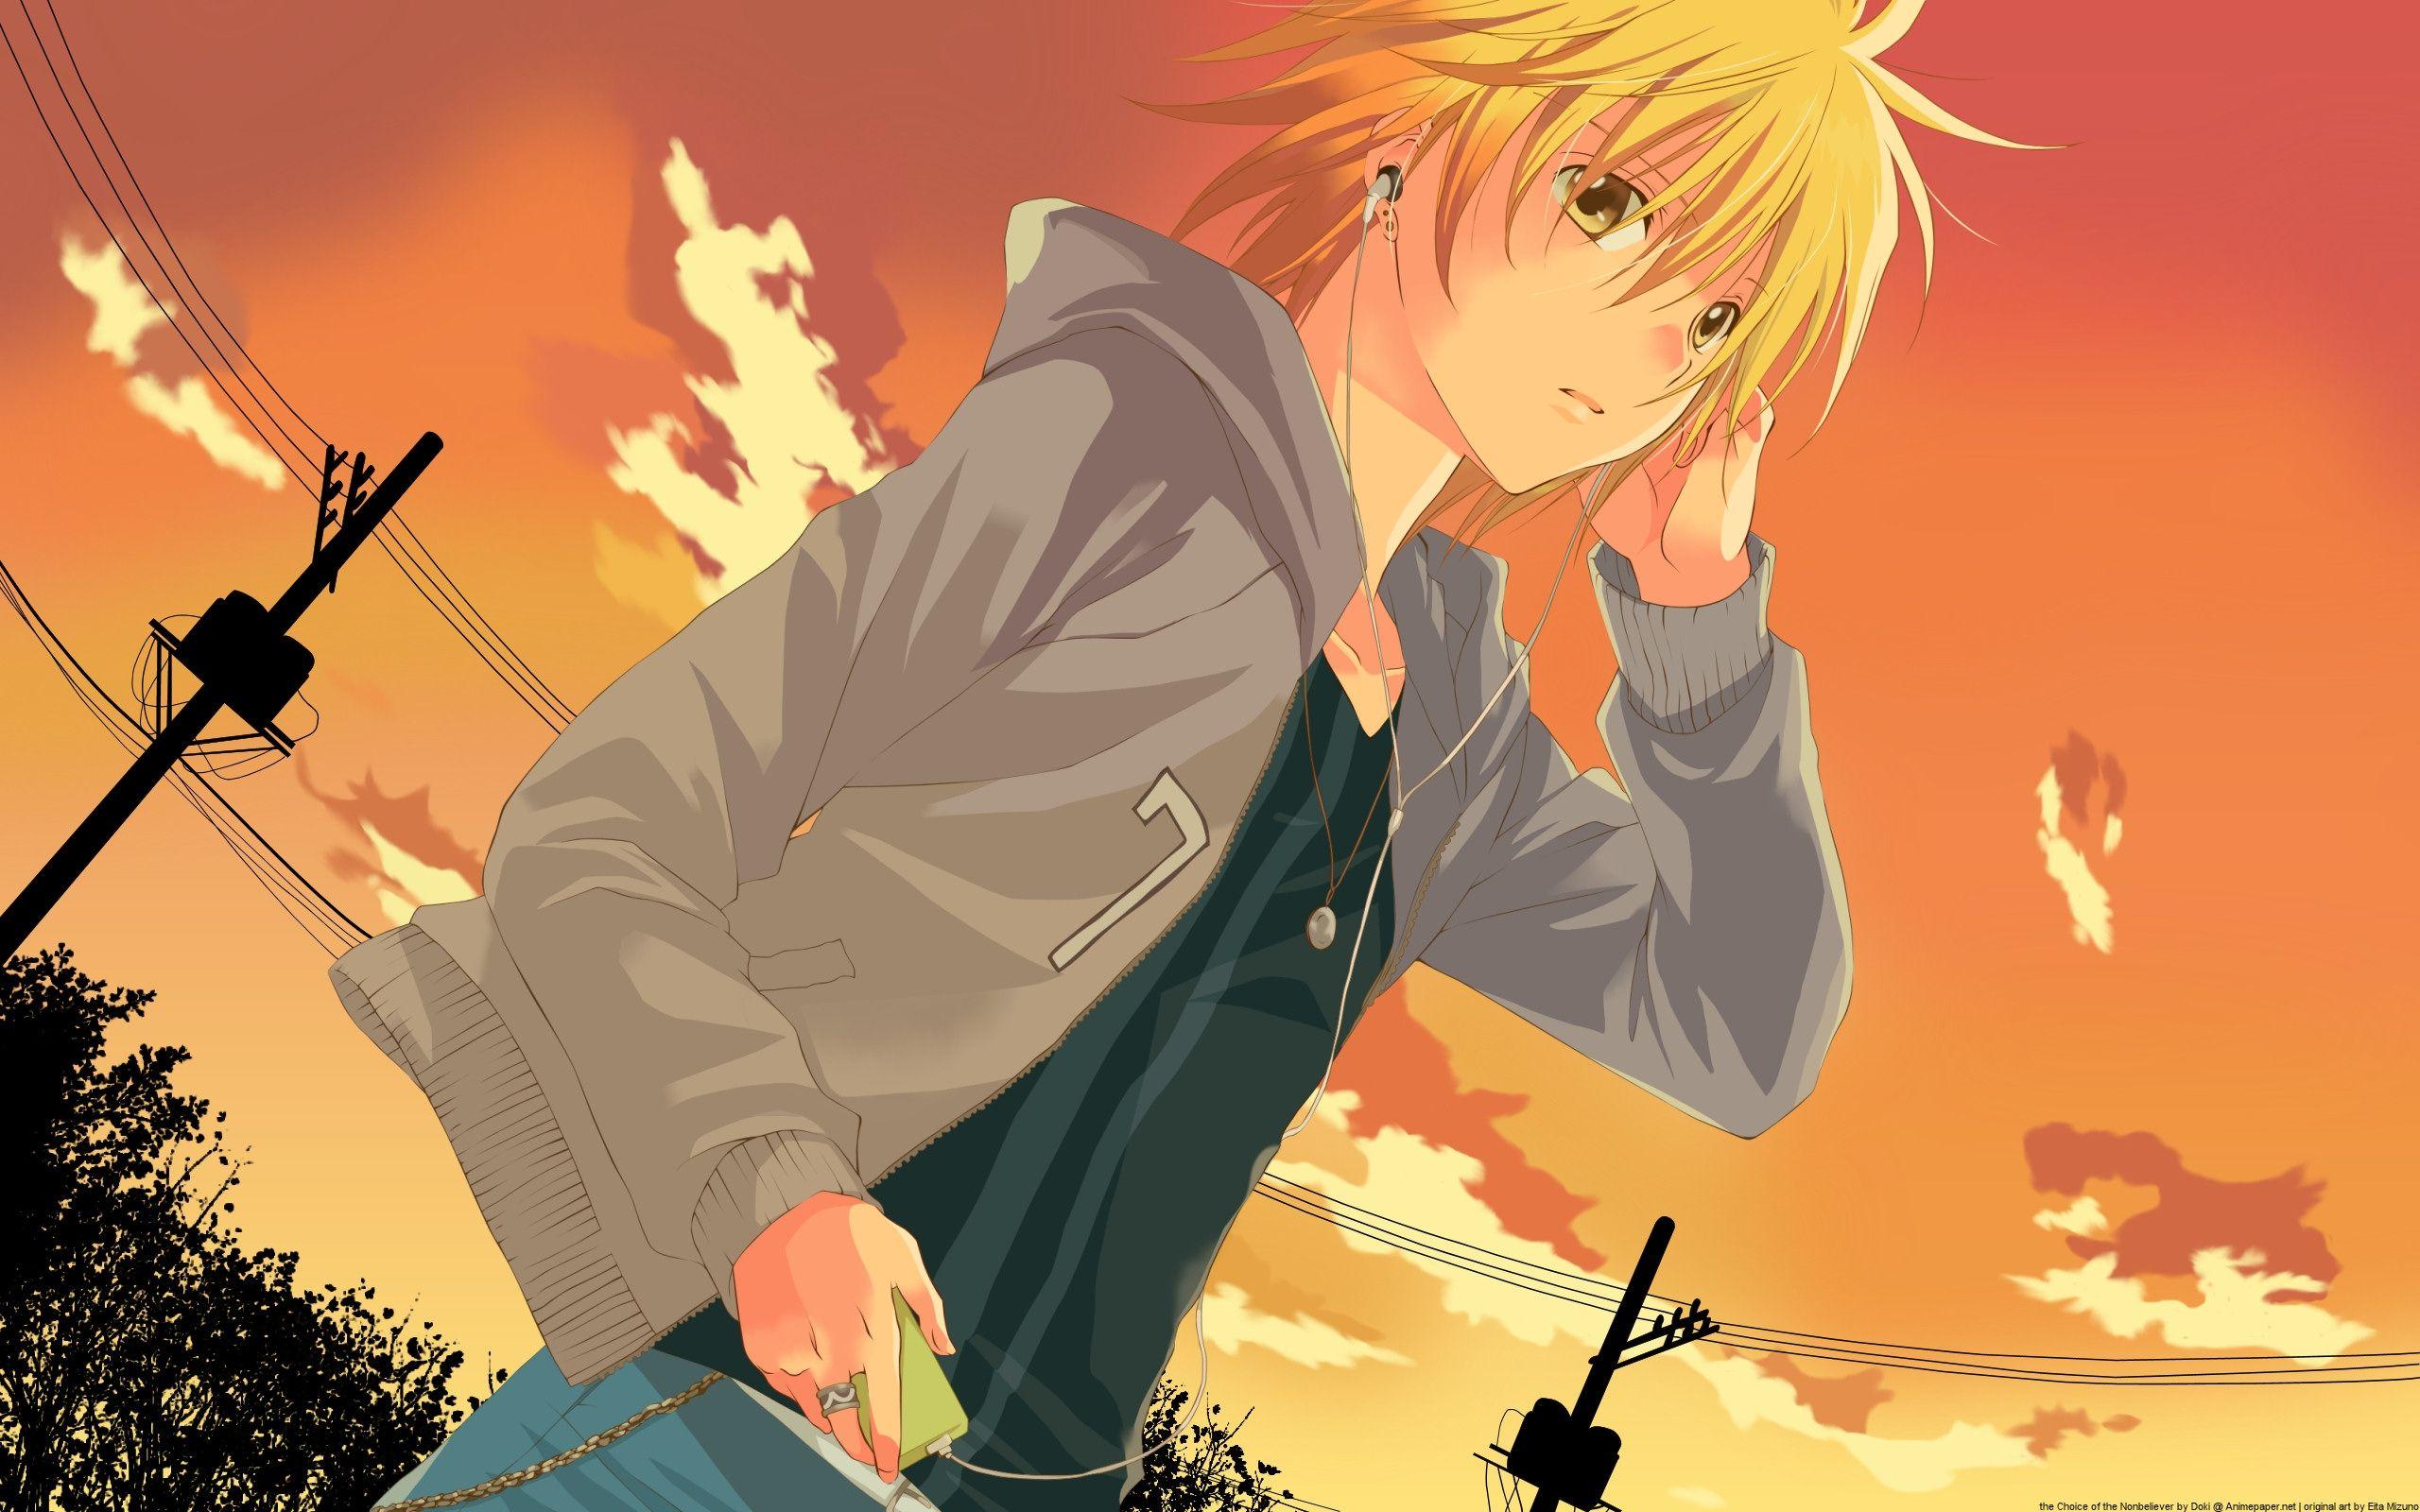 Anime Boy Music Wallpaper Hd 1080P 12 HD Wallpapers